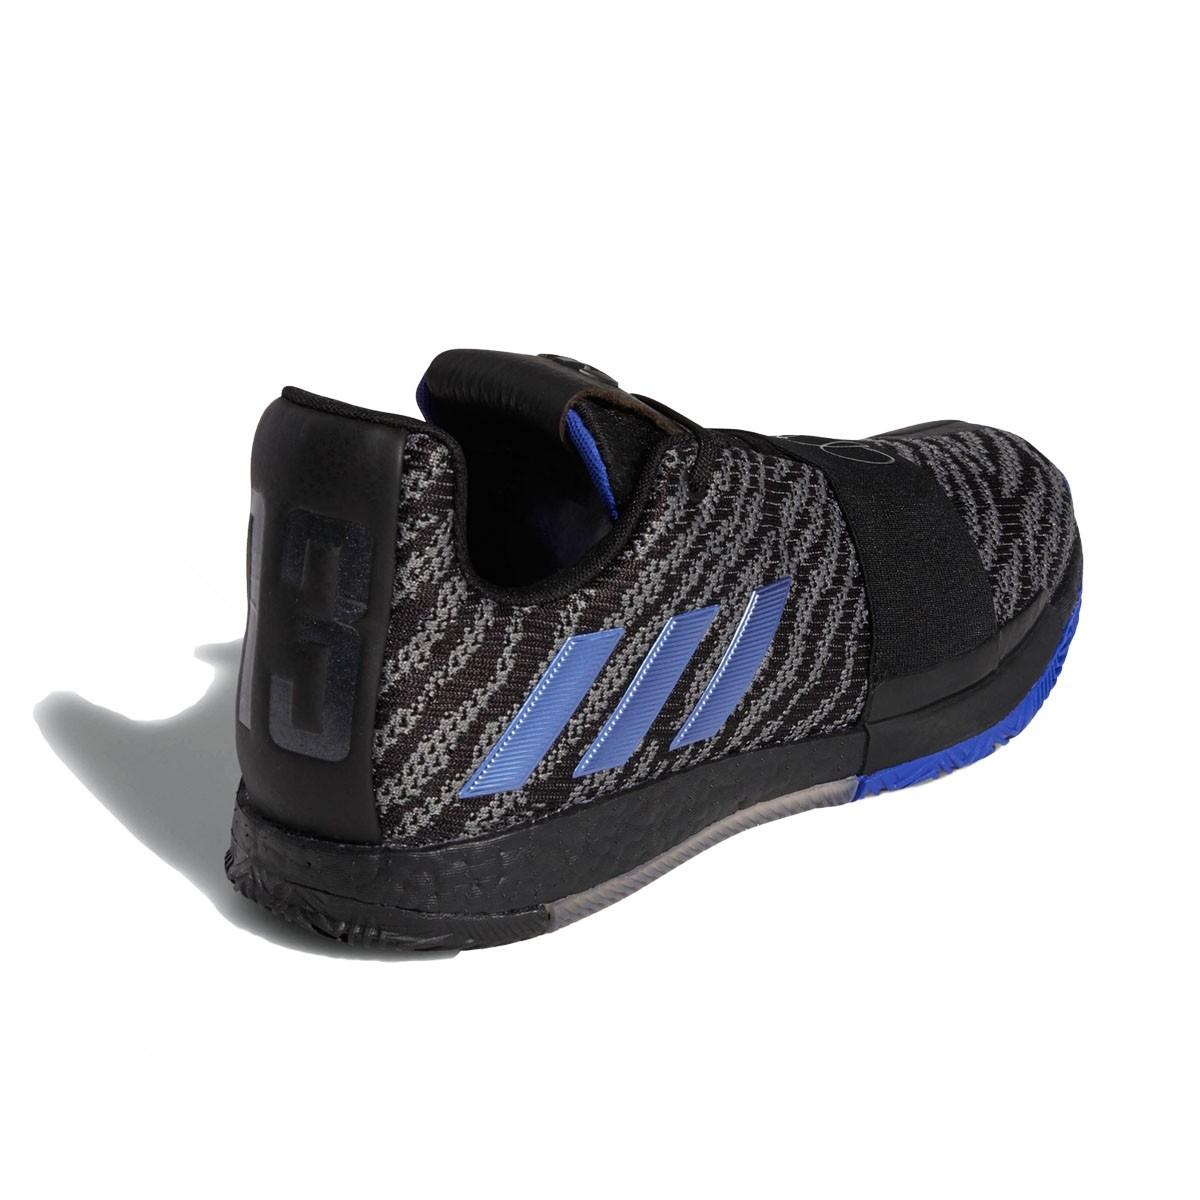 83f4d2787572 Buy ADIDAS Harden Vol.3  Black Zebra  Basketball shoes   sneakers